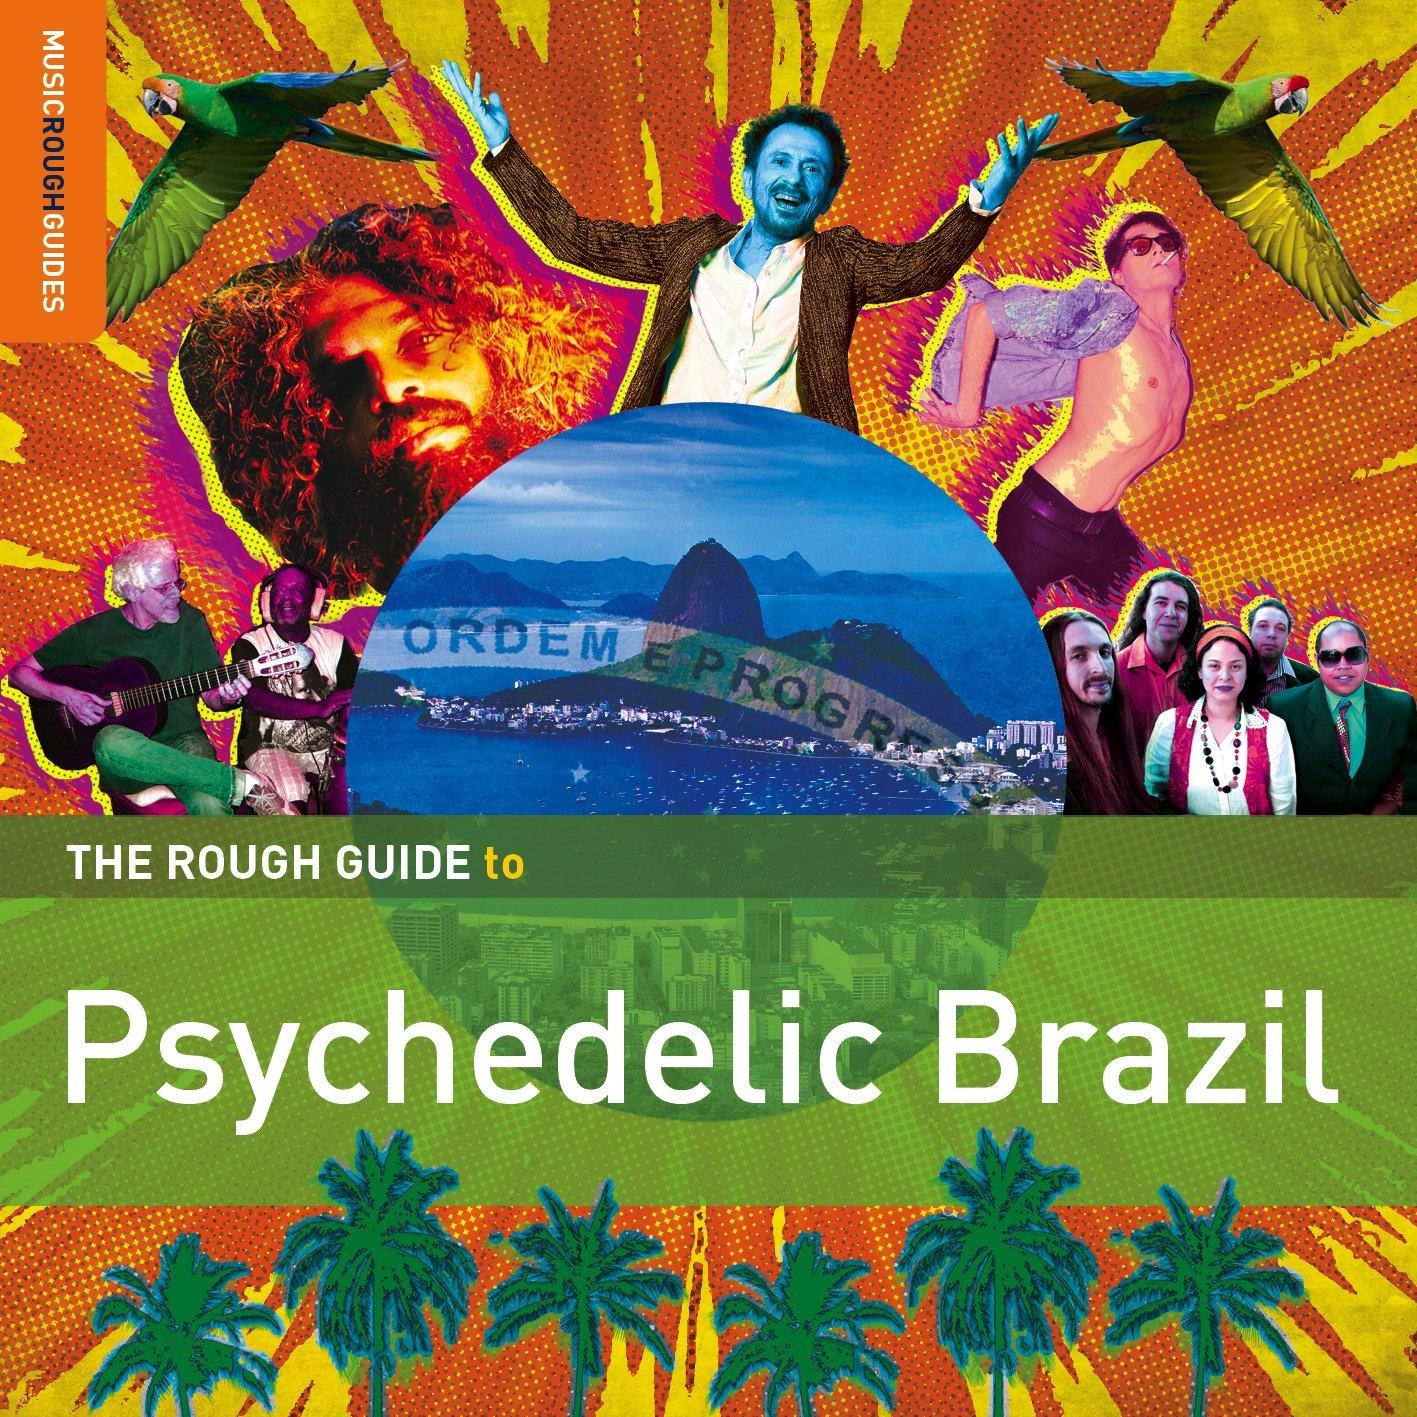 rough-guide-brazil-cover